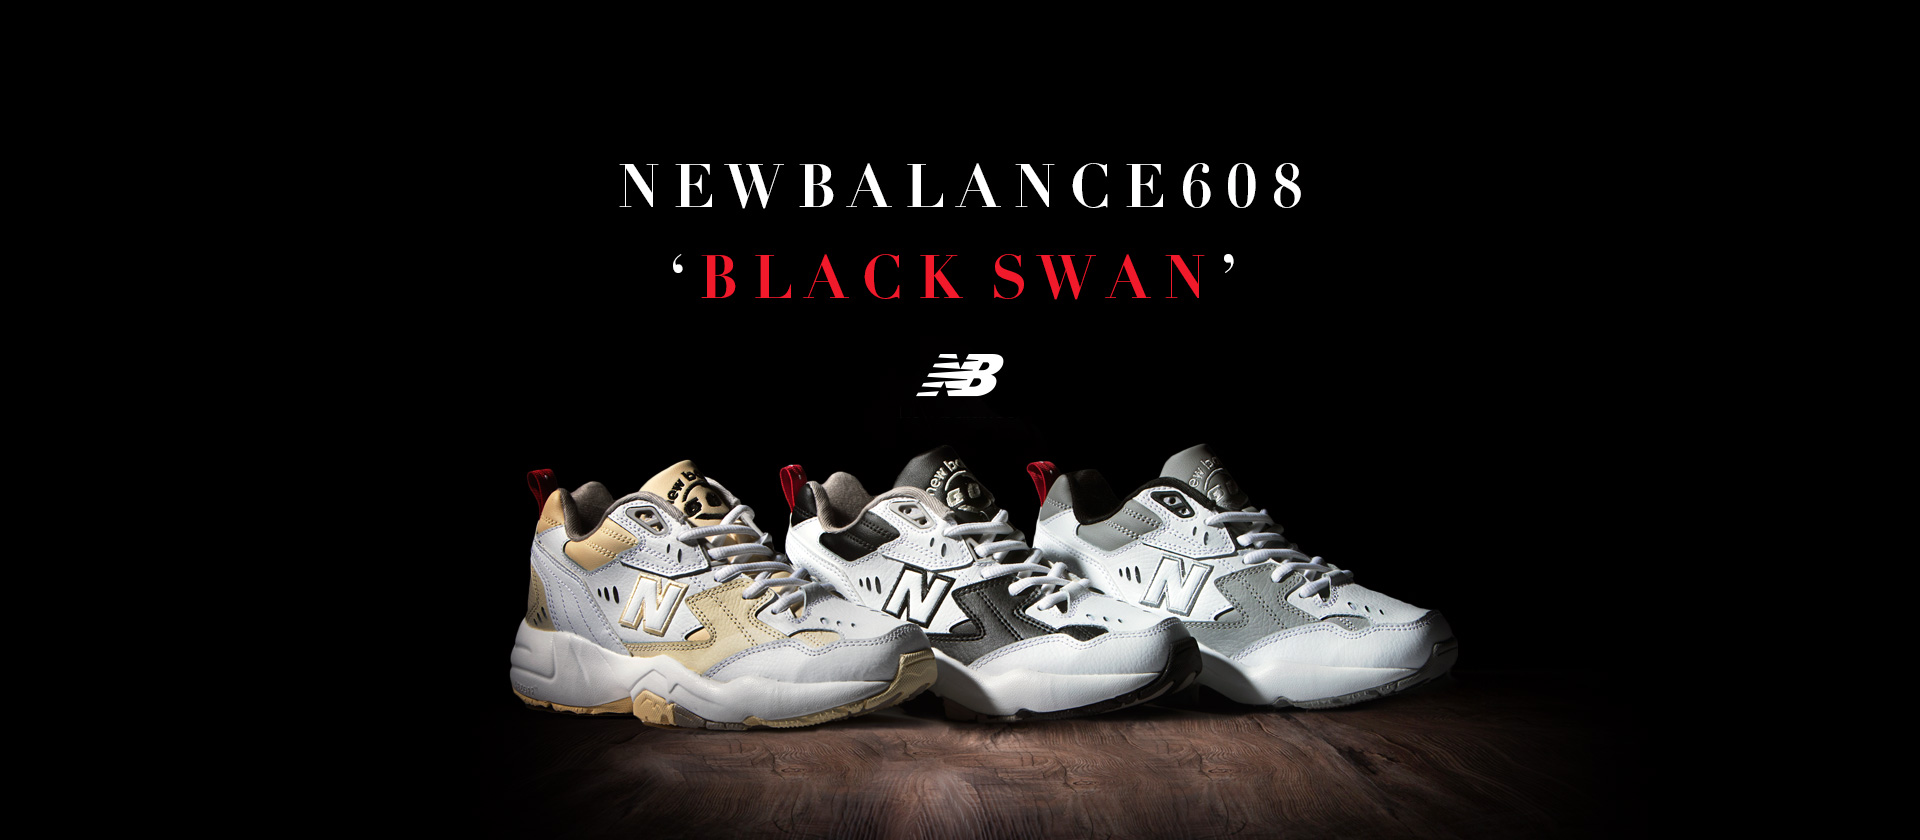 blackswan608